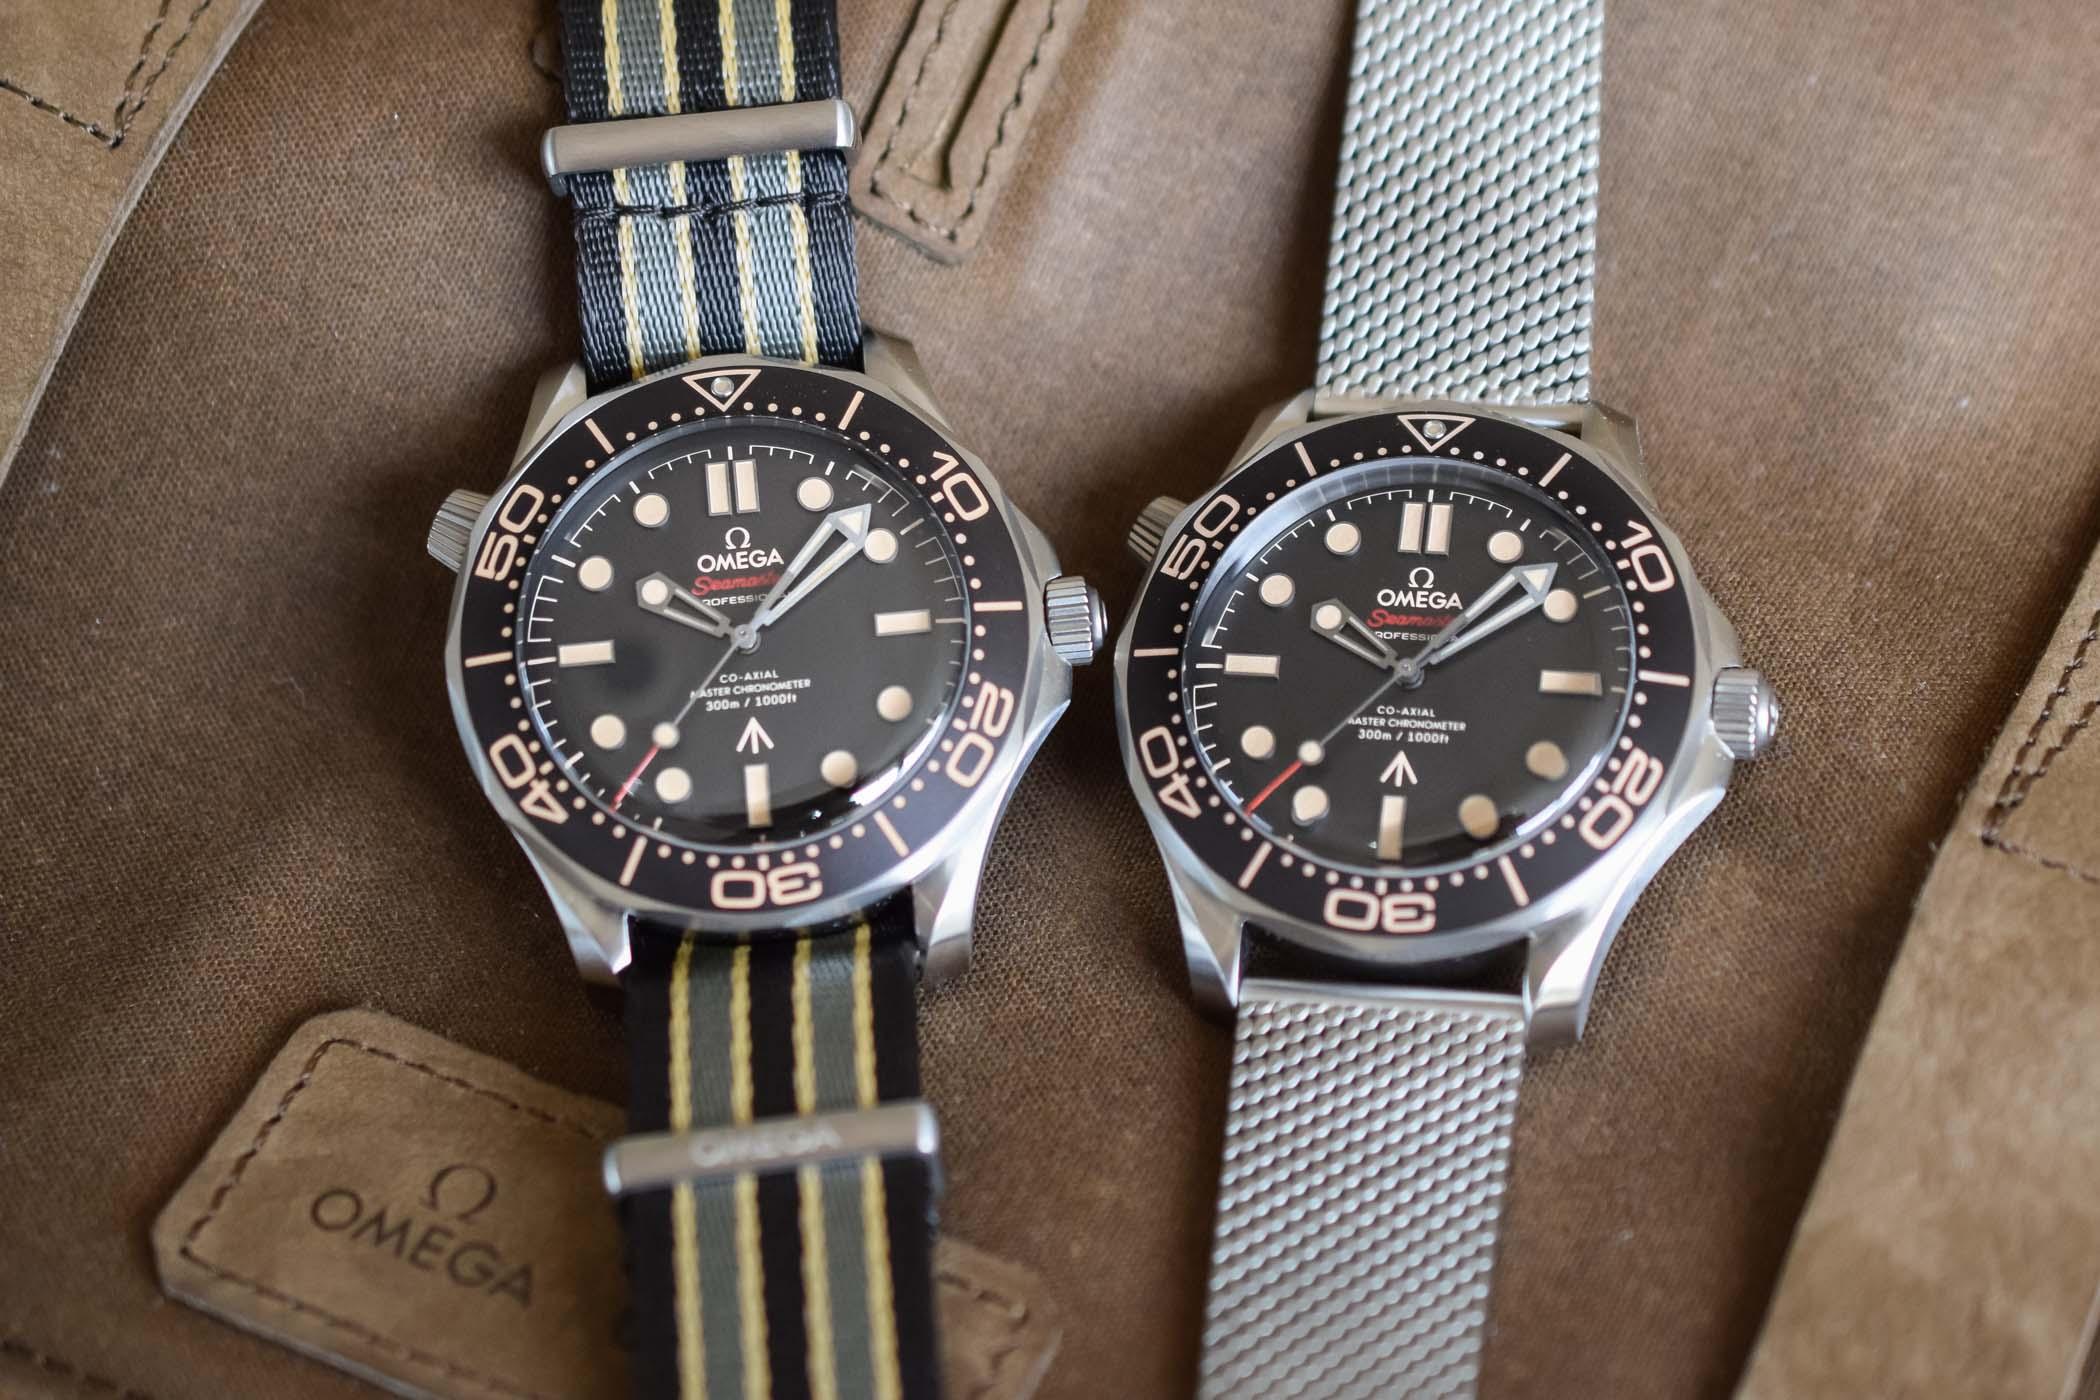 Name:  Omega-Seamaster-Diver-300M-007-Edition-210.90.42.20.01.001-12.jpg Views: 90 Size:  292.8 KB